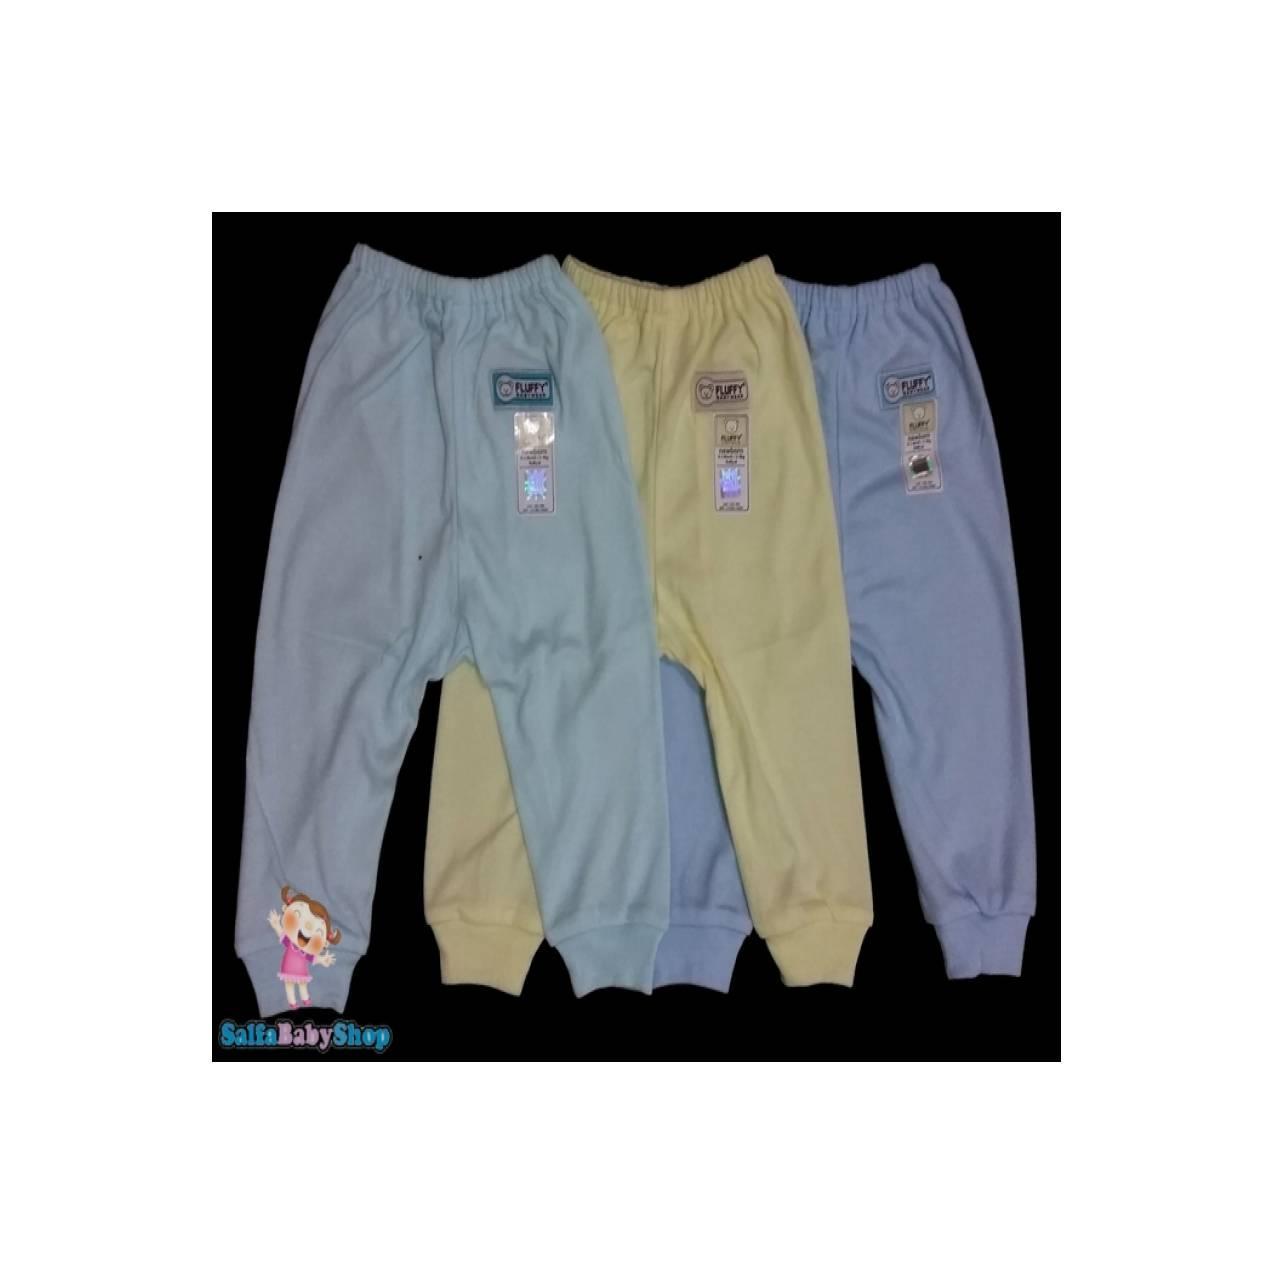 Celana Bayi Fluffy Size 0-3 Bulan (Lusinan)